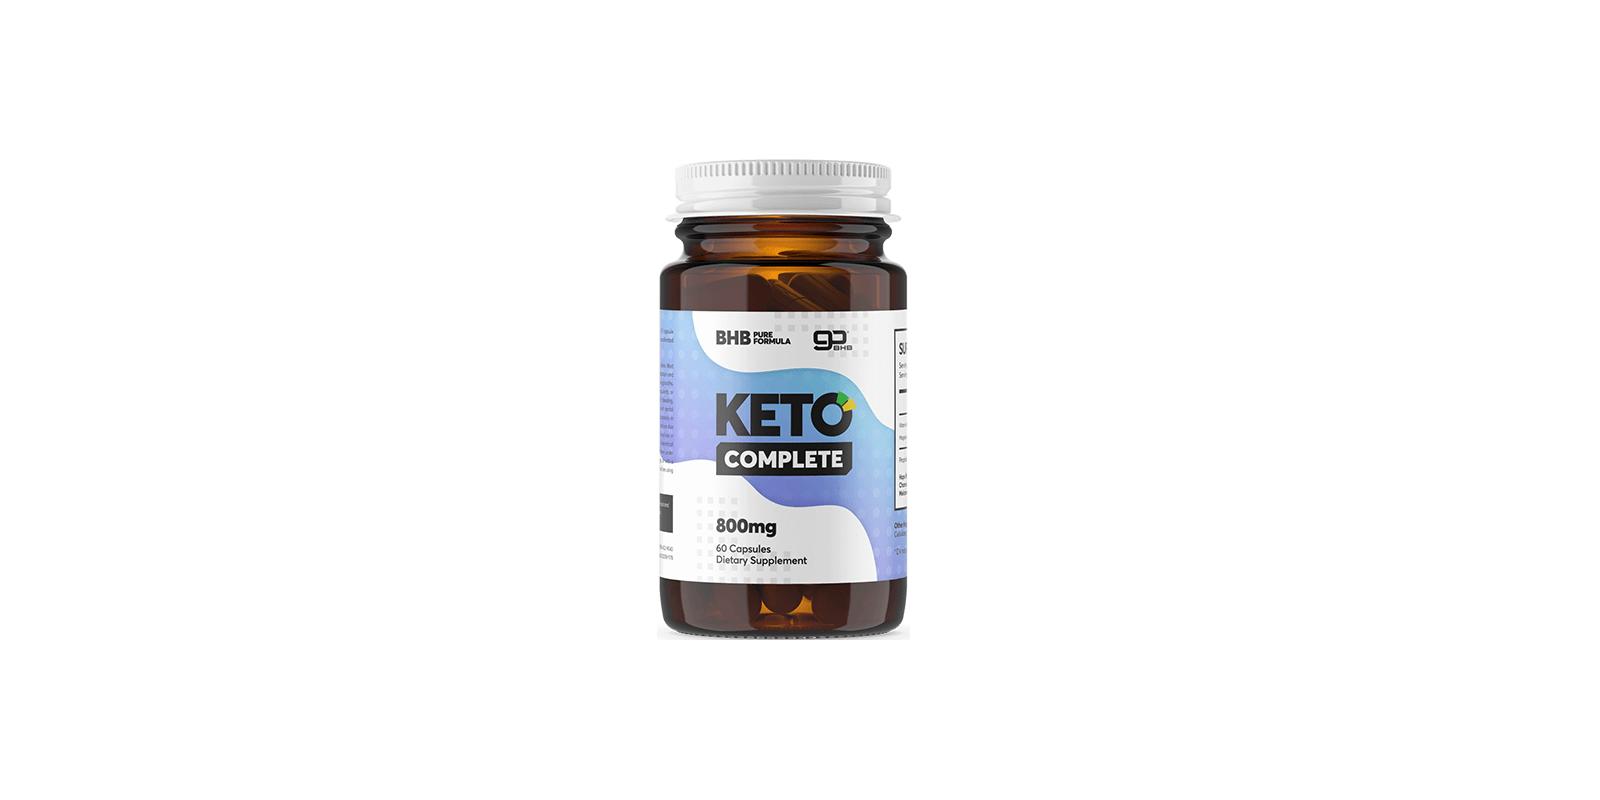 Keto Complete Reviews